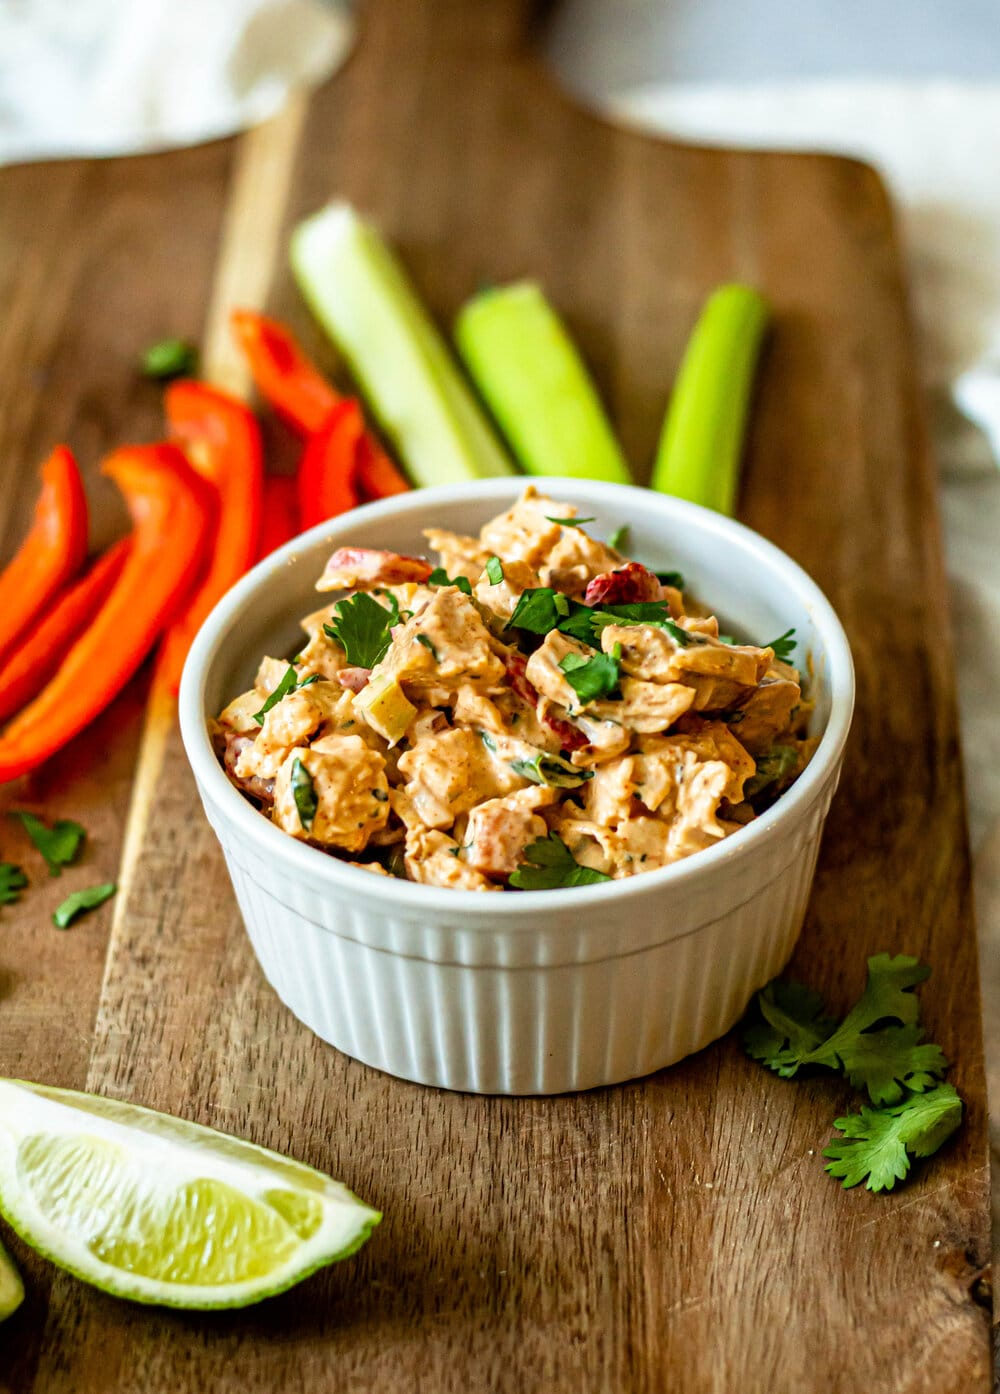 Chipotle Chicken Salad (Whole30, Paleo, Keto)